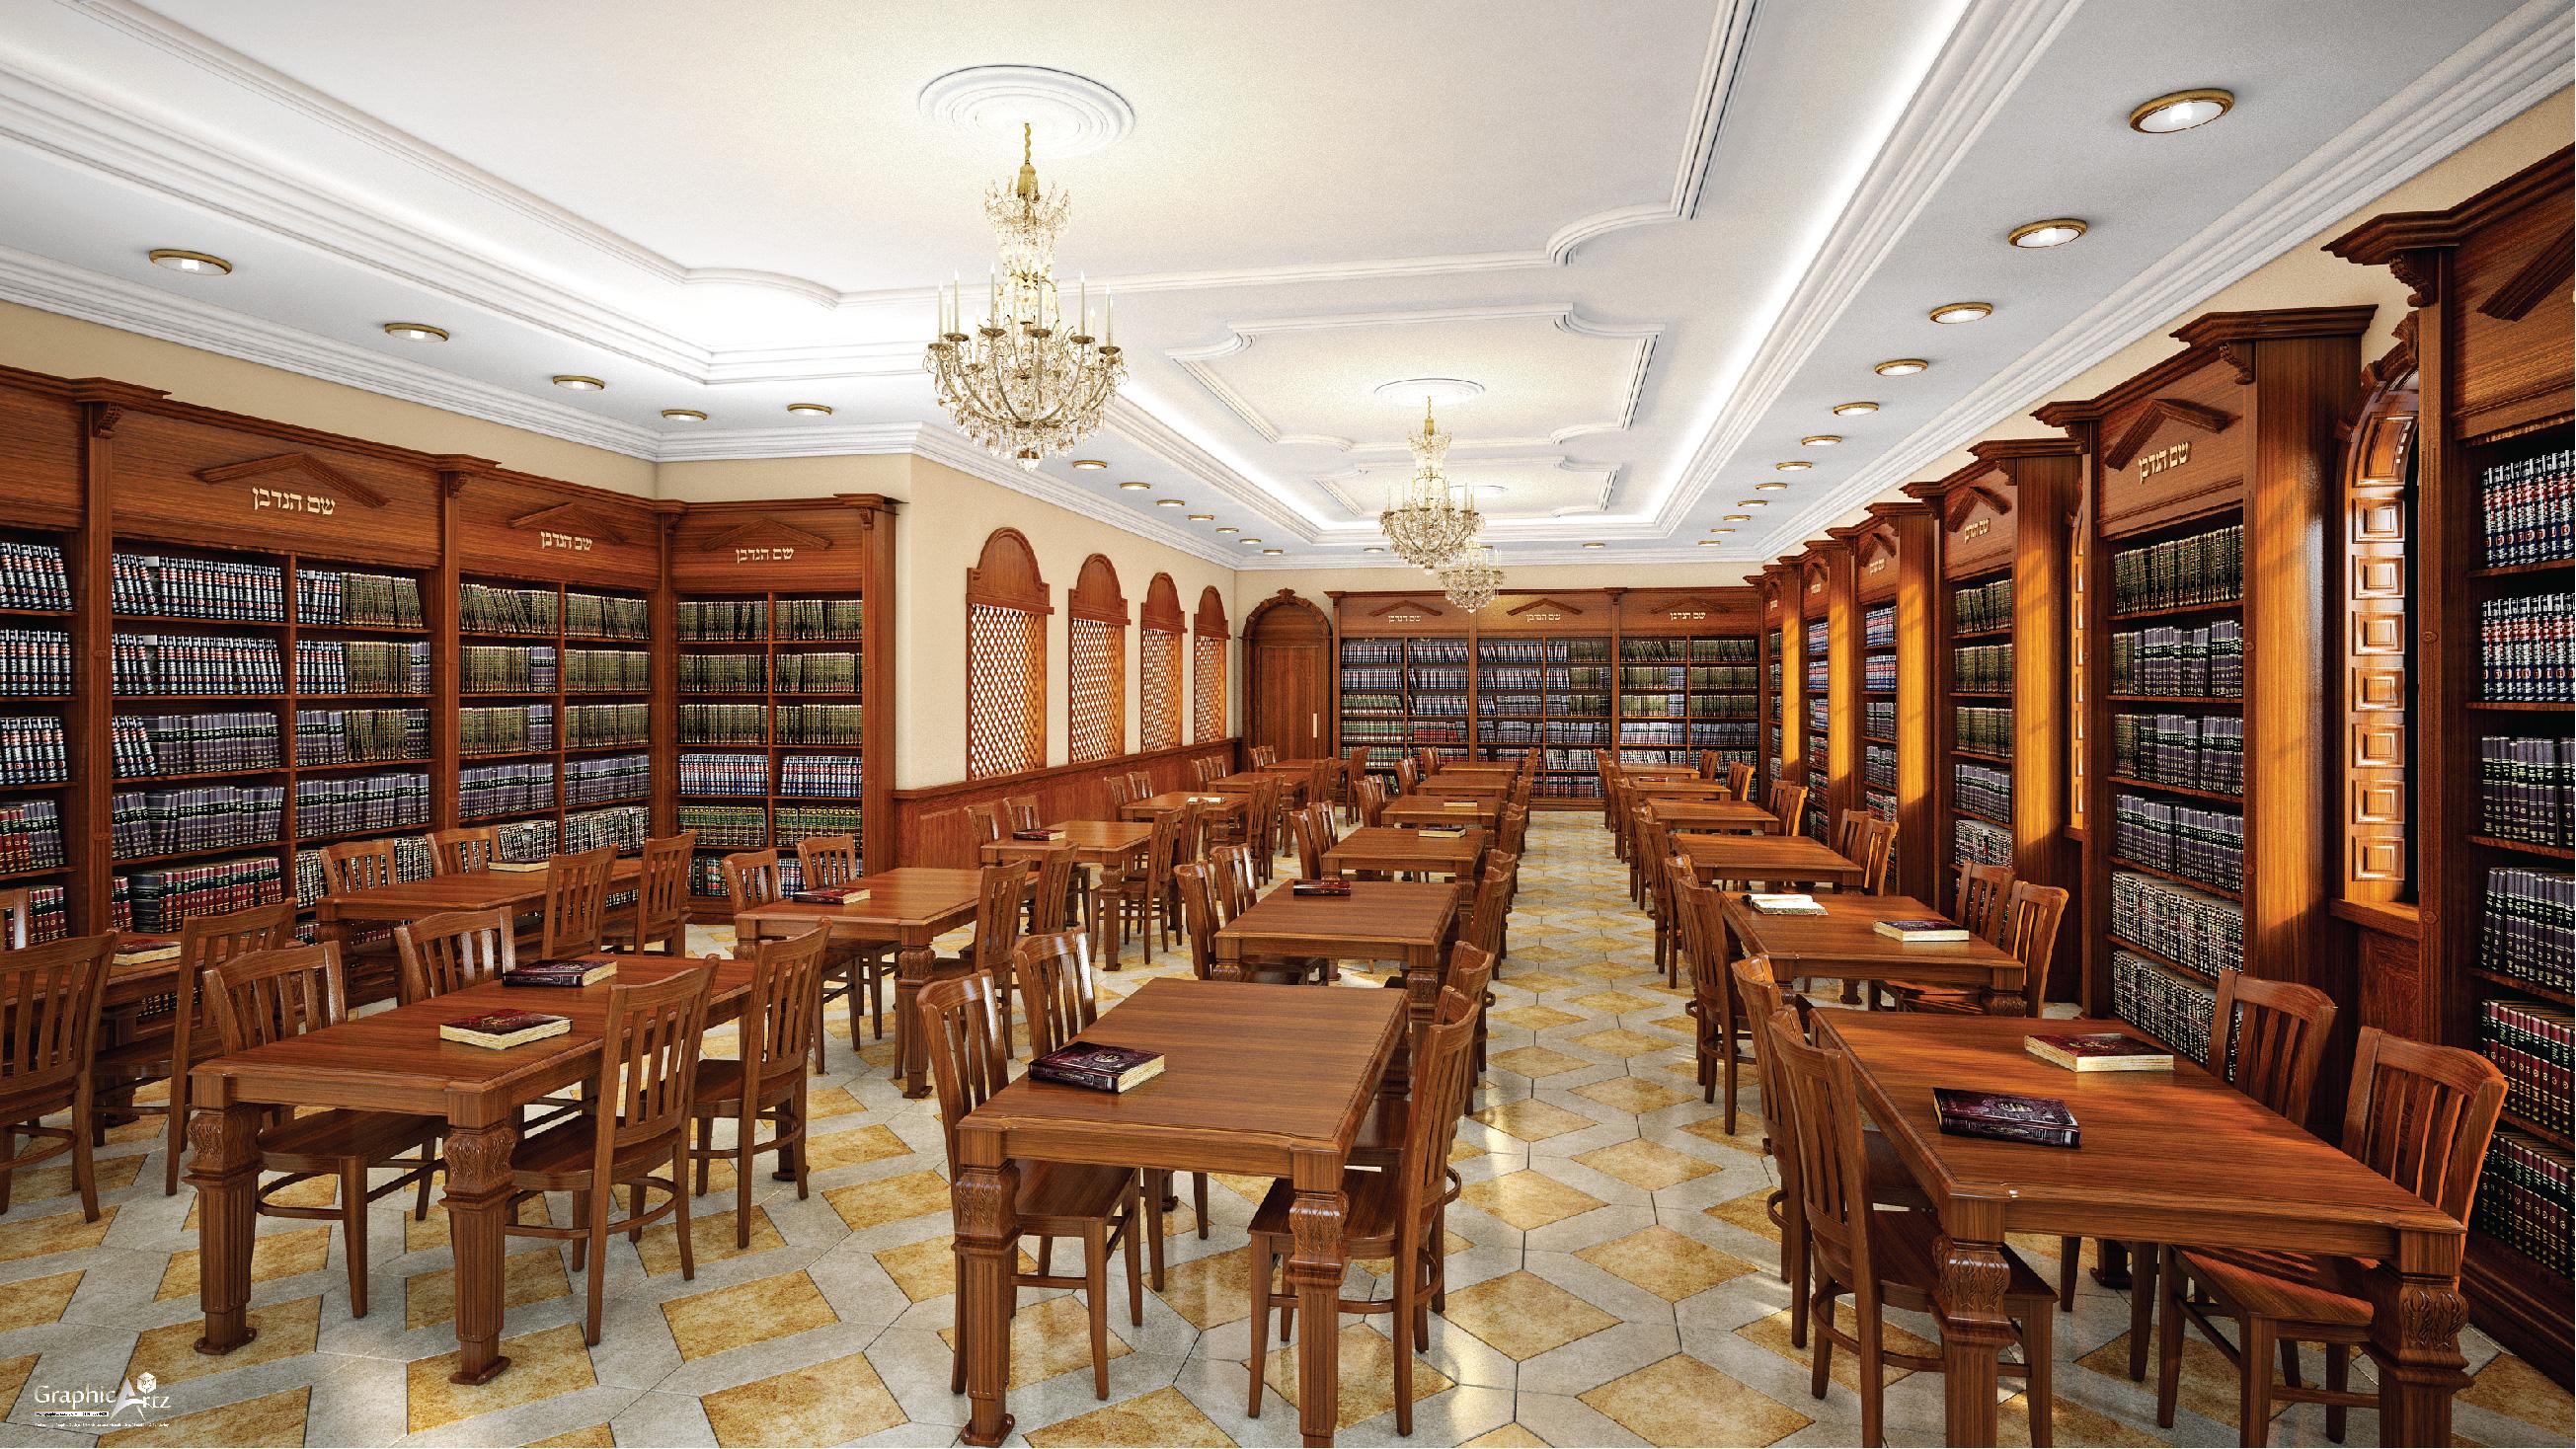 Heichal Hatorah Shul interior CGI